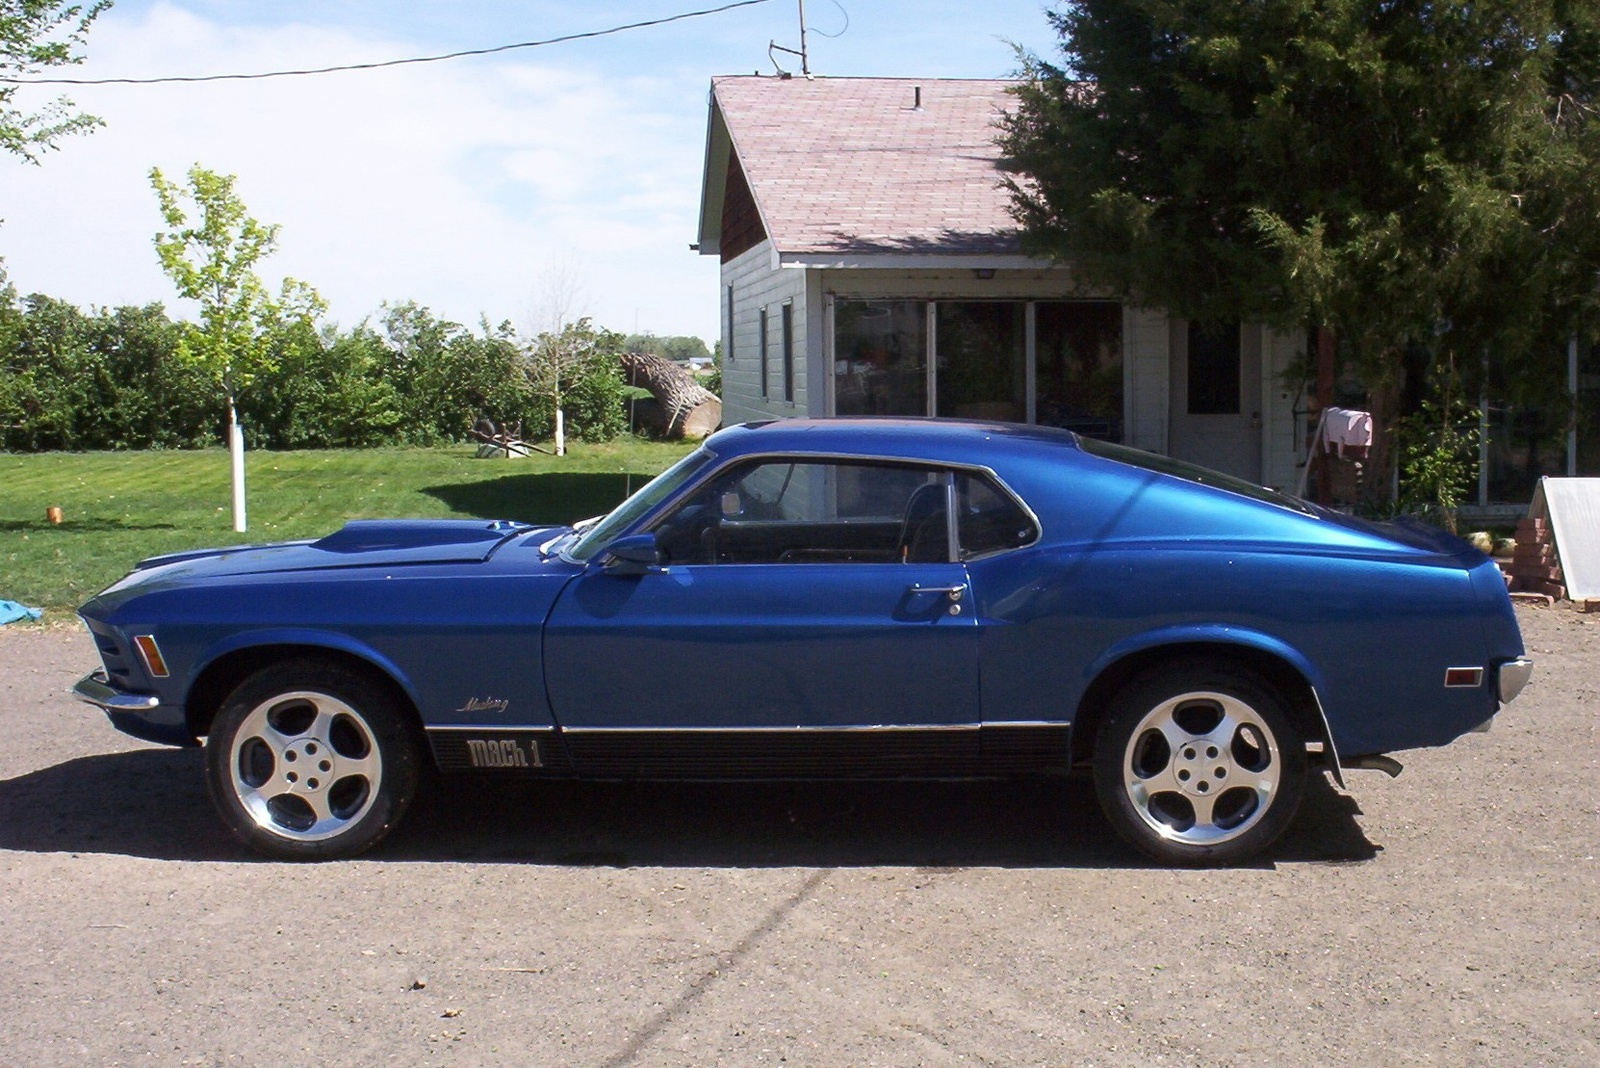 429 Mach1 For Sale.html | Autos Weblog